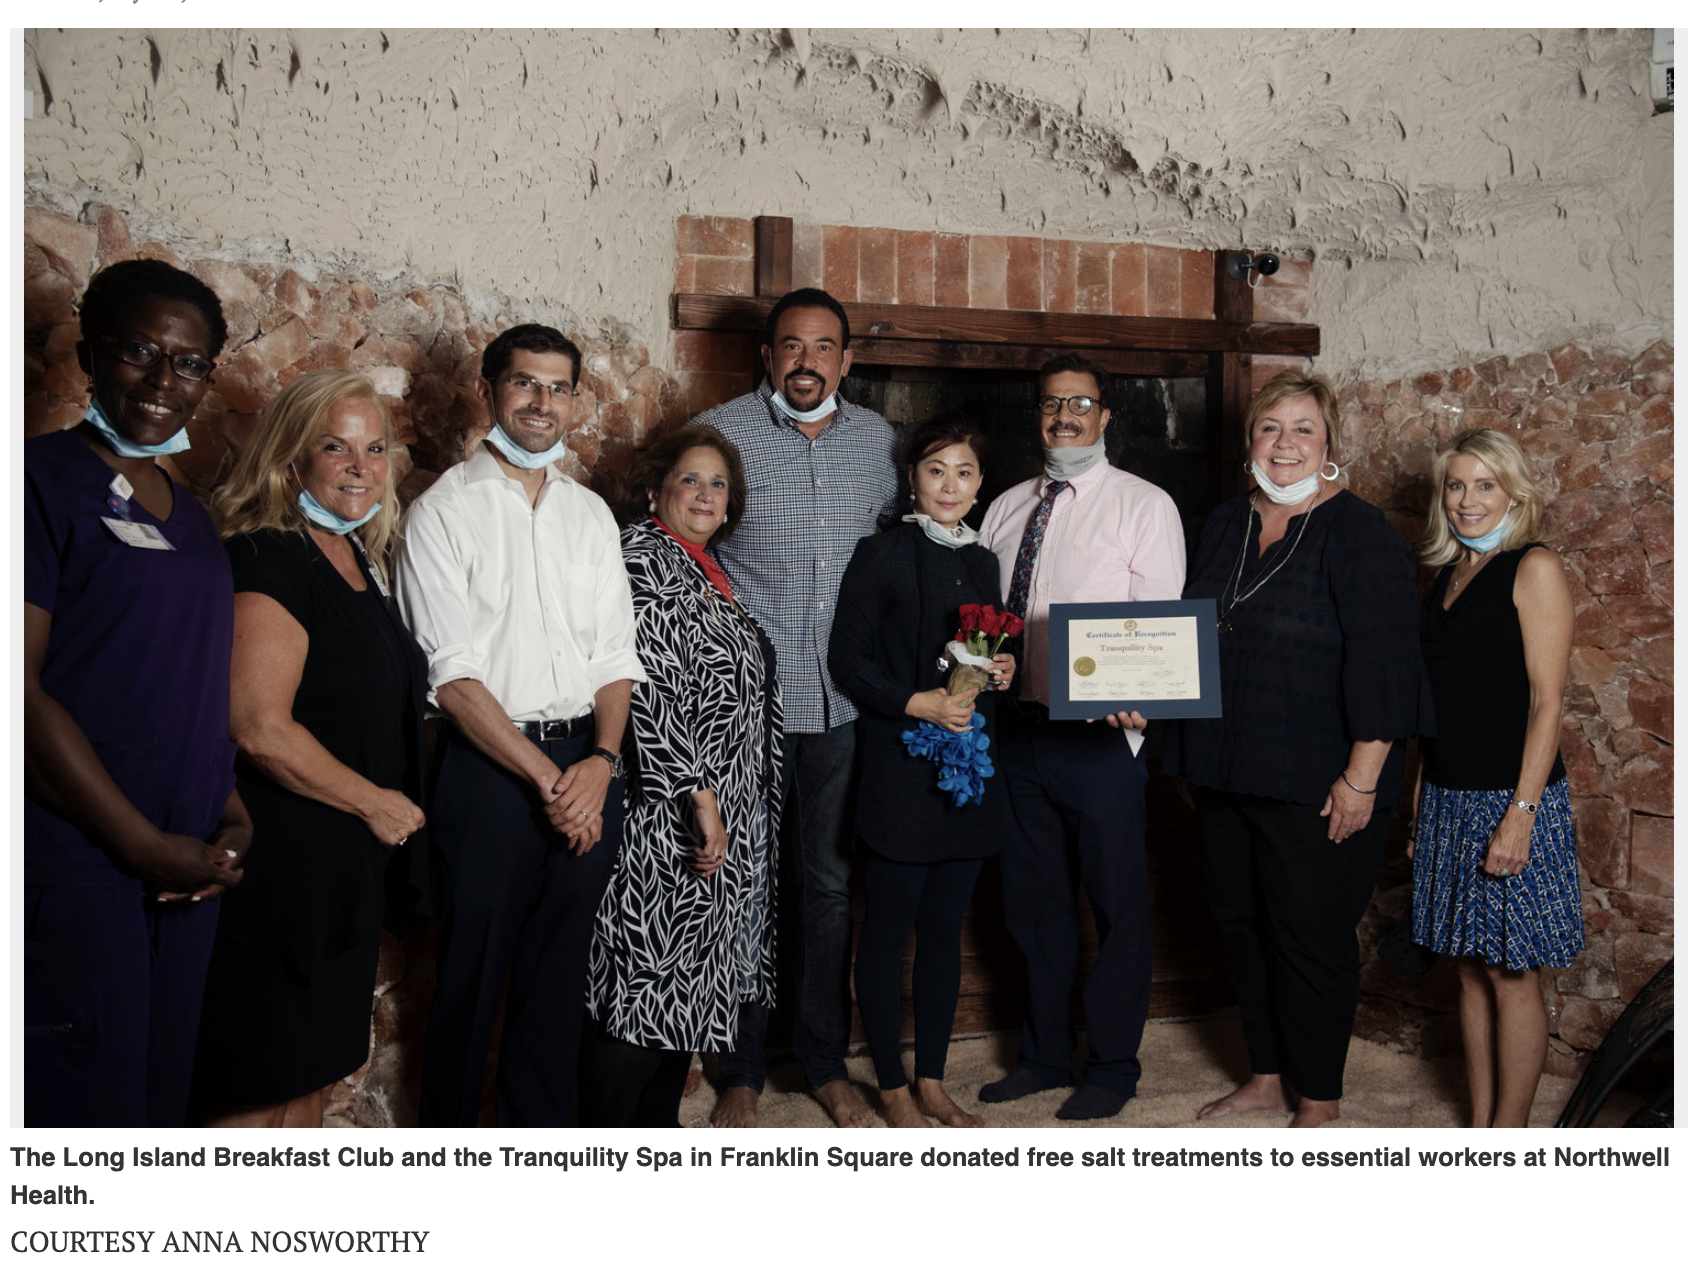 Long Island Breakfast Club helps to aid essential workers